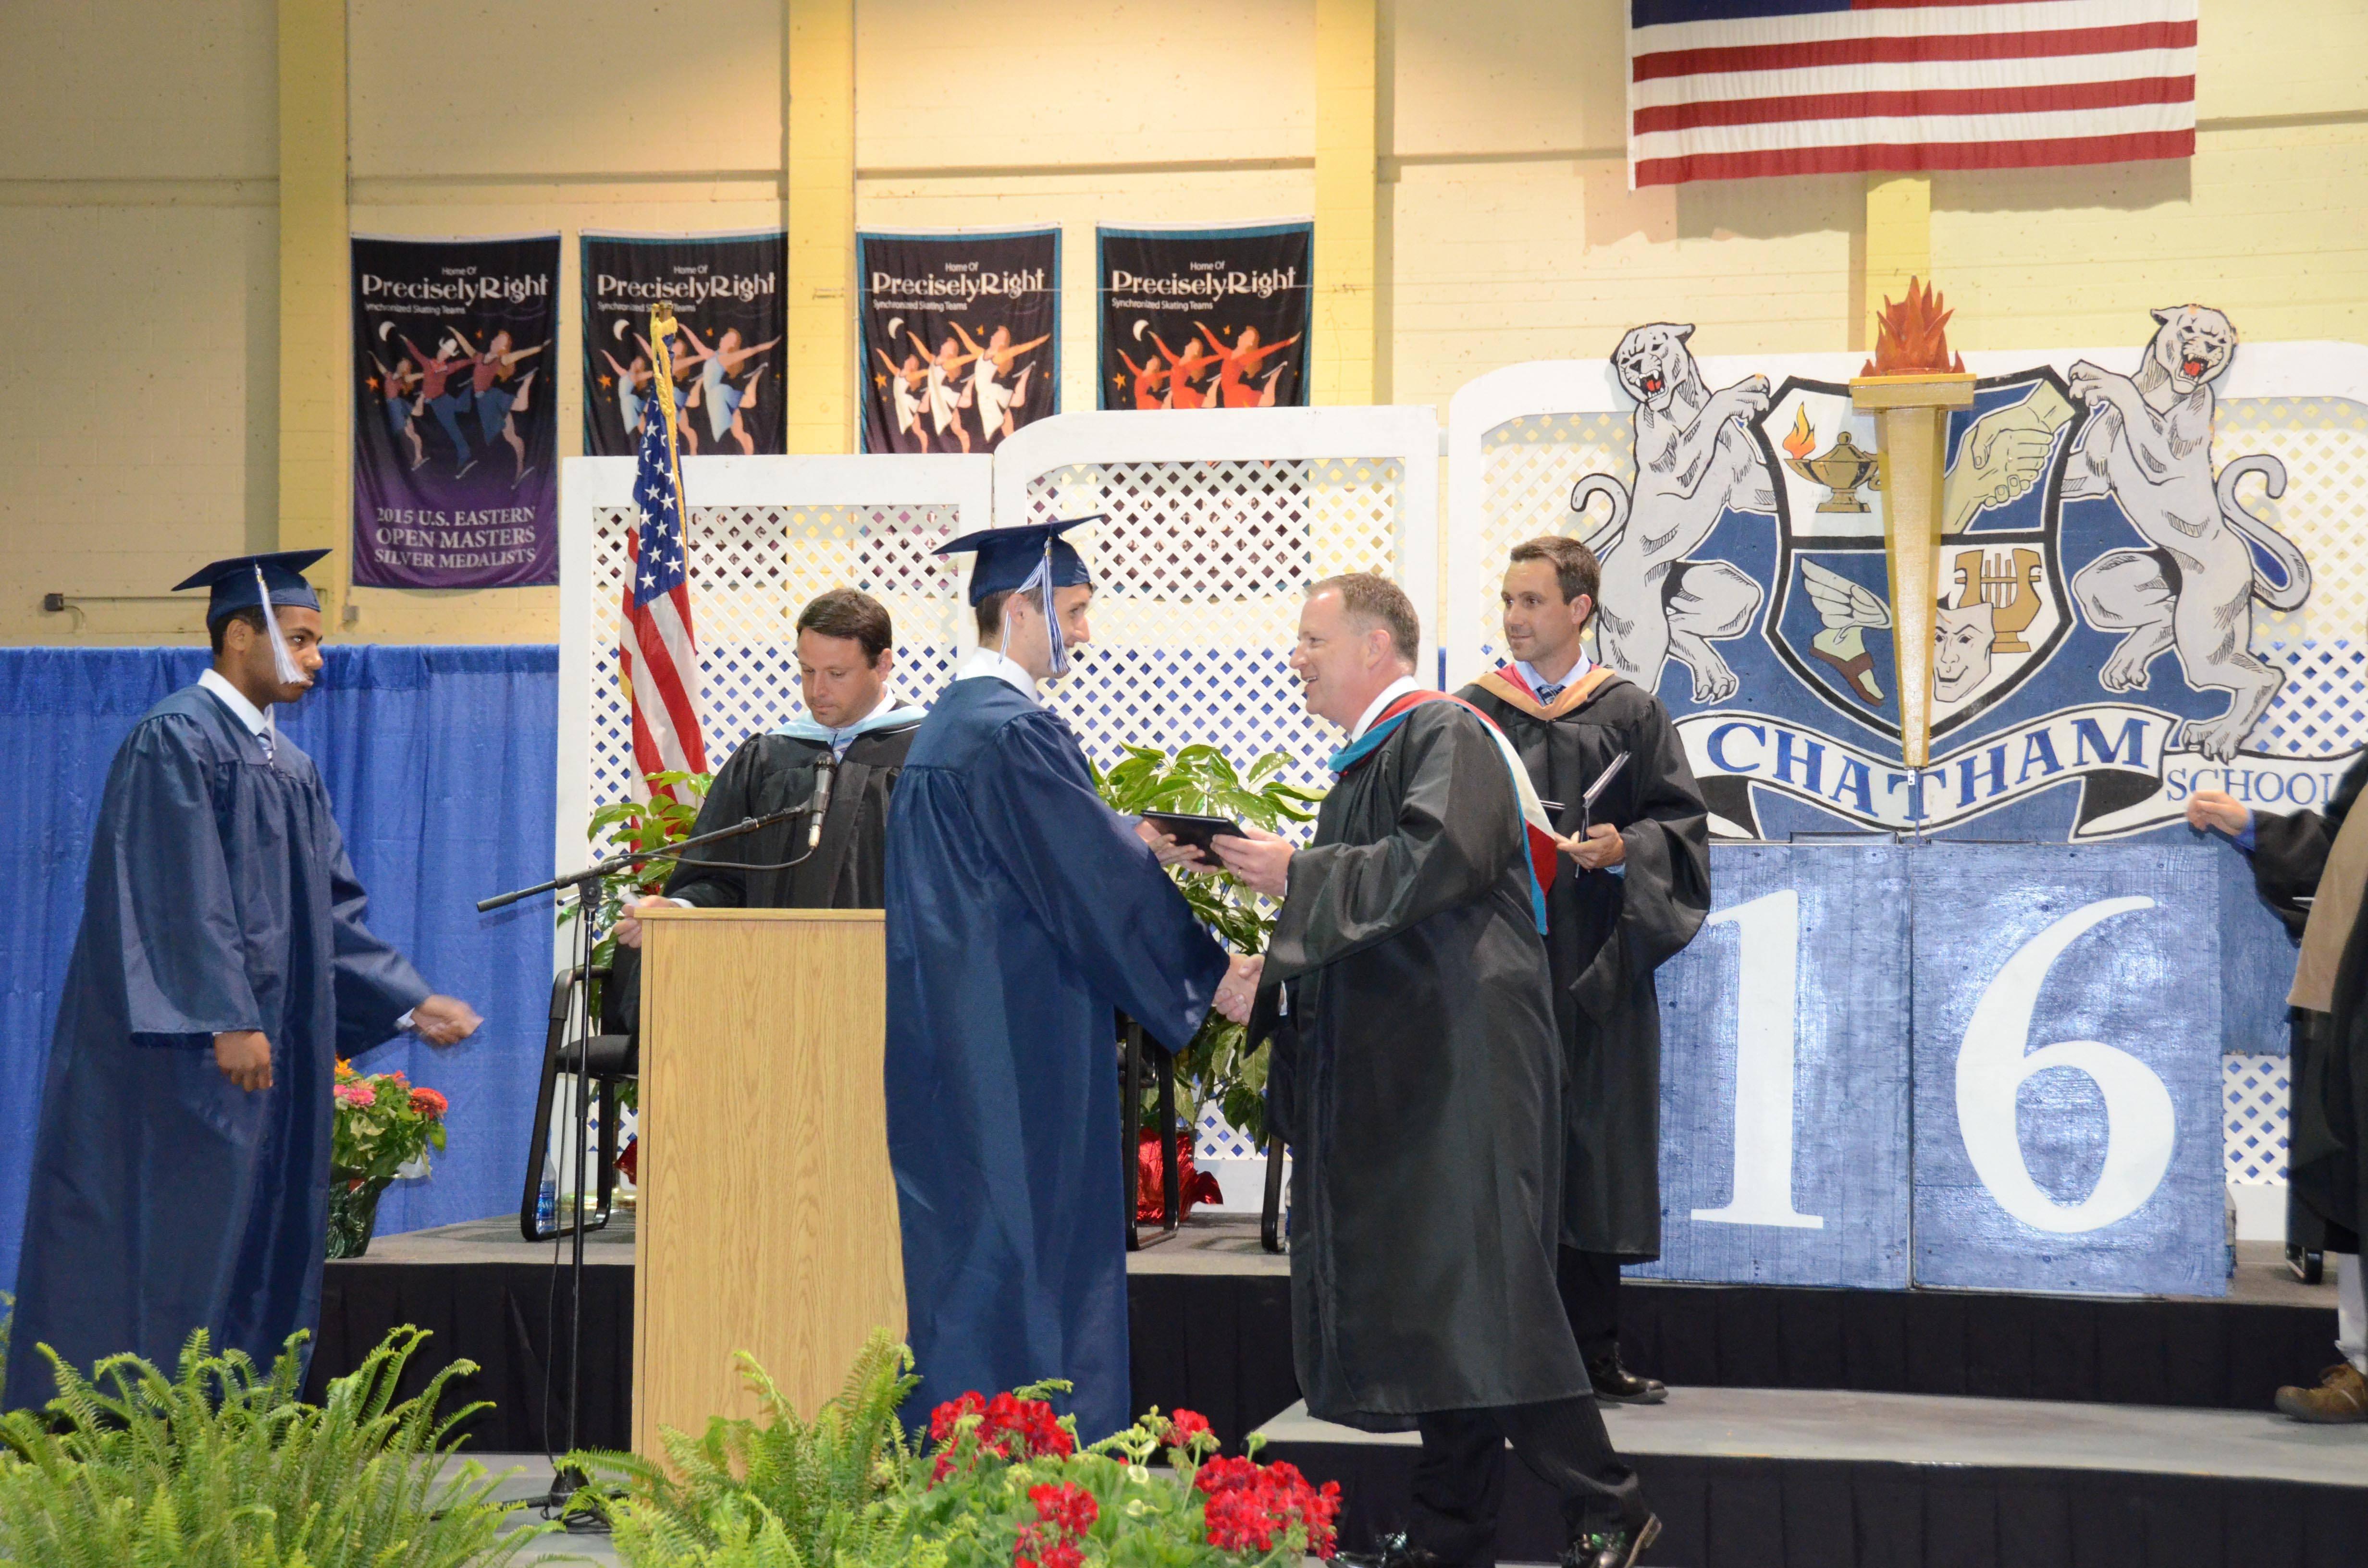 2aeee16a6ee21ba0d62f_CHS_Graduation_2016_ACZ_McCabe_DSC_2089.jpg